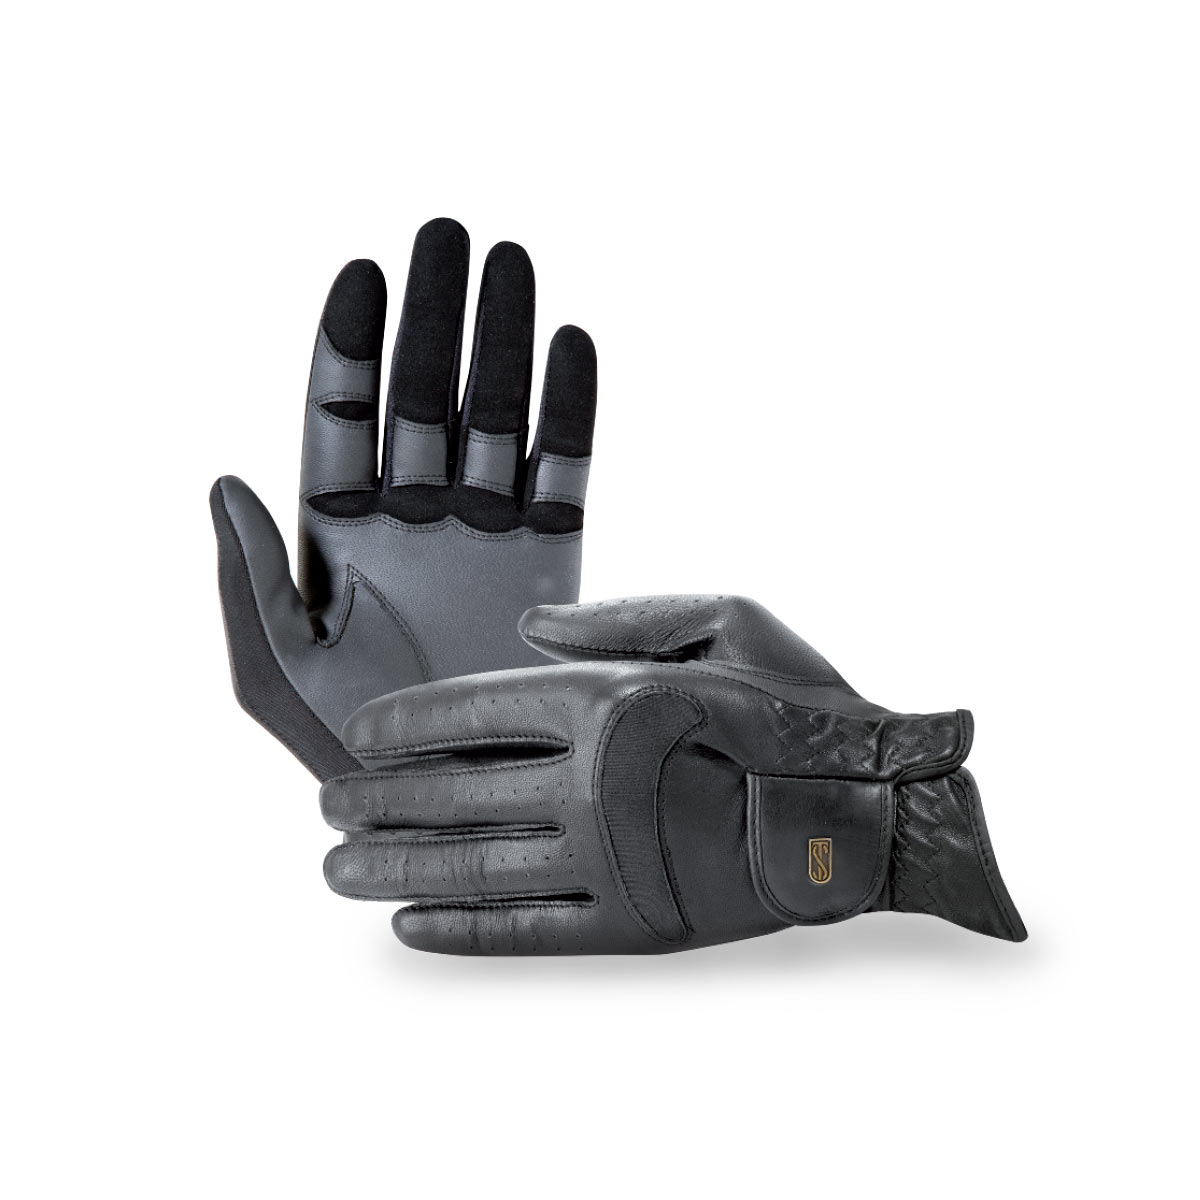 Tredstep Dressage Pro Riding Gloves